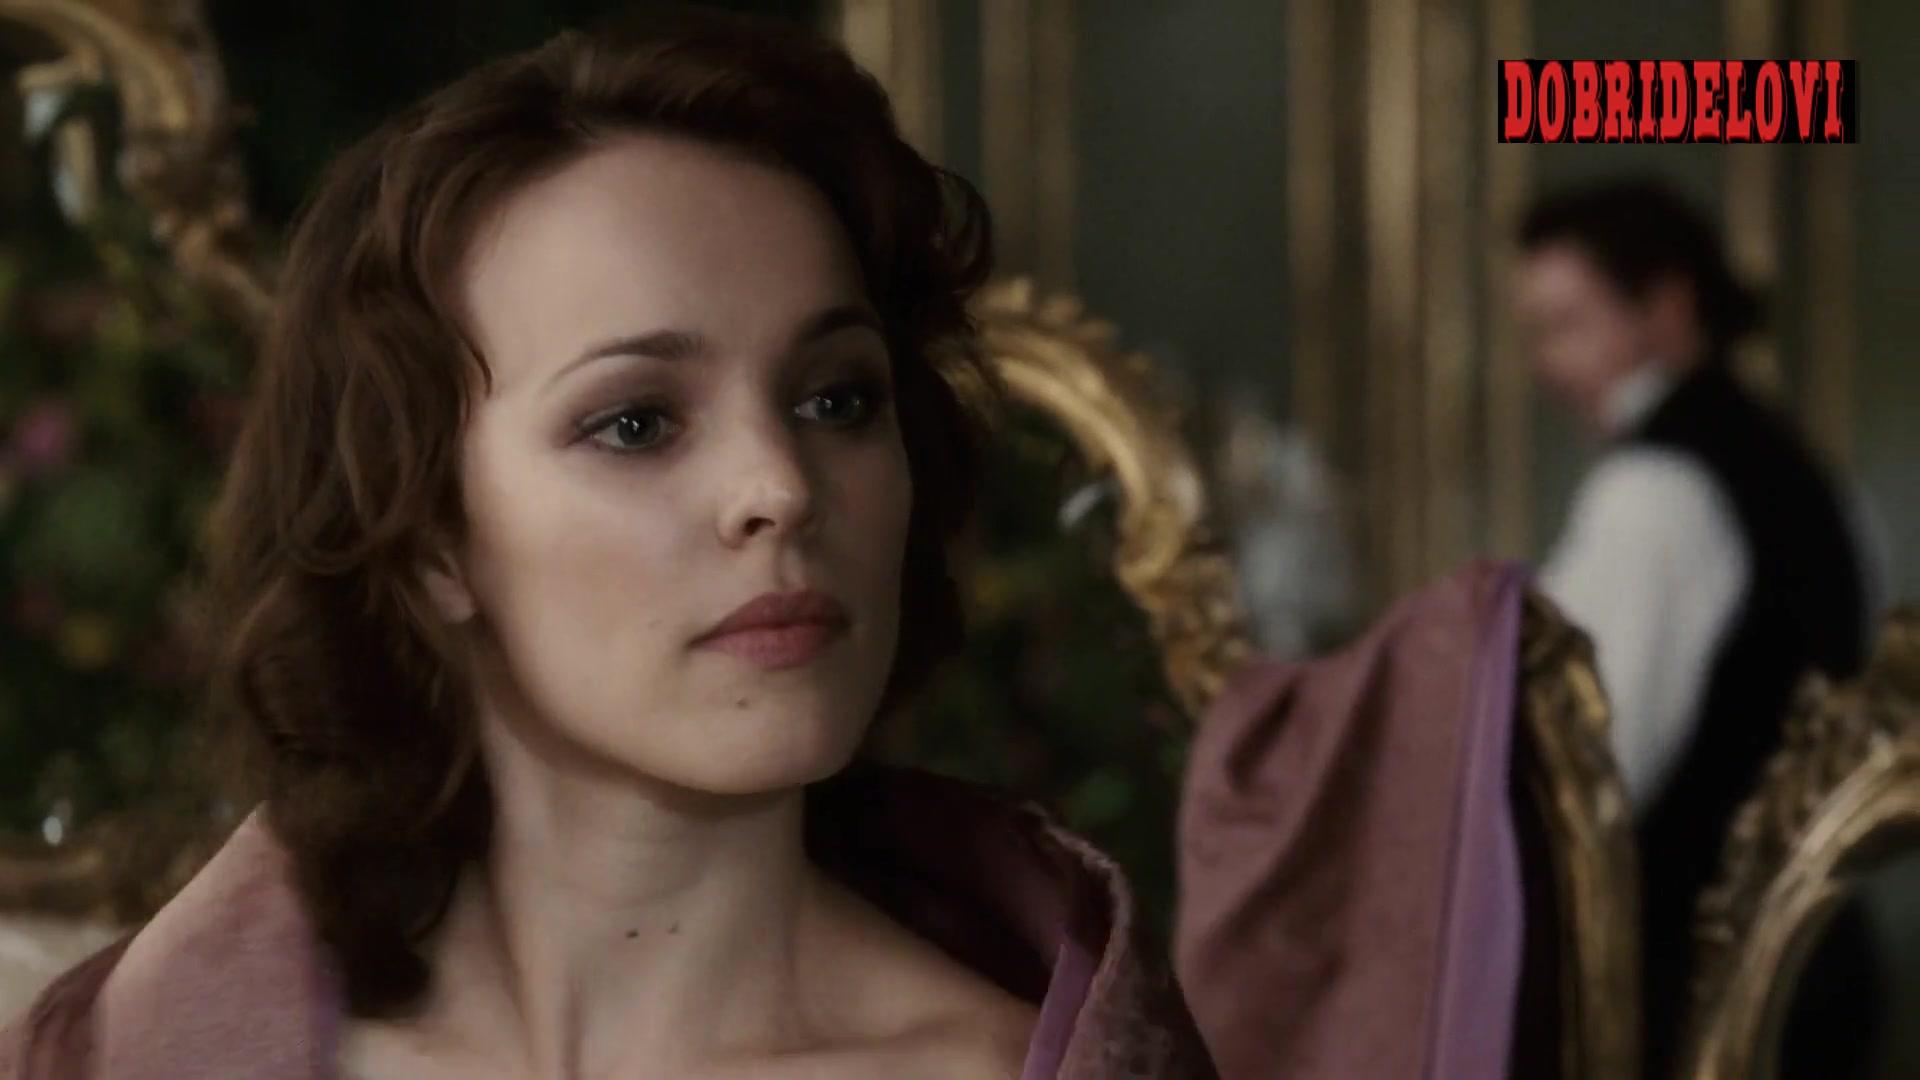 Rachel McAdams with exposed back scene from Sherlock Holmes